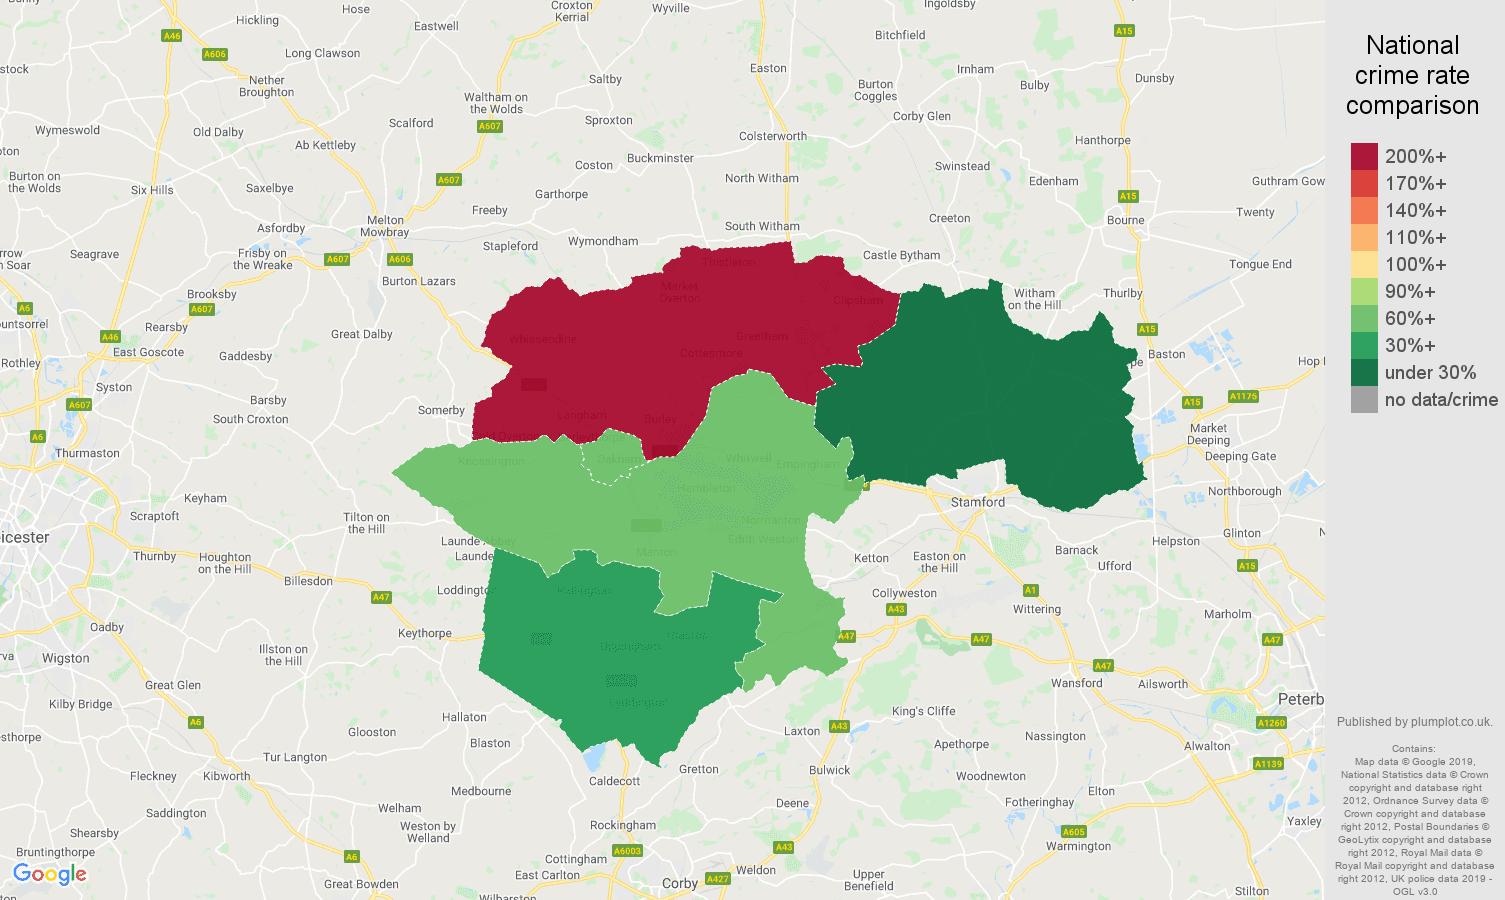 Rutland other crime rate comparison map